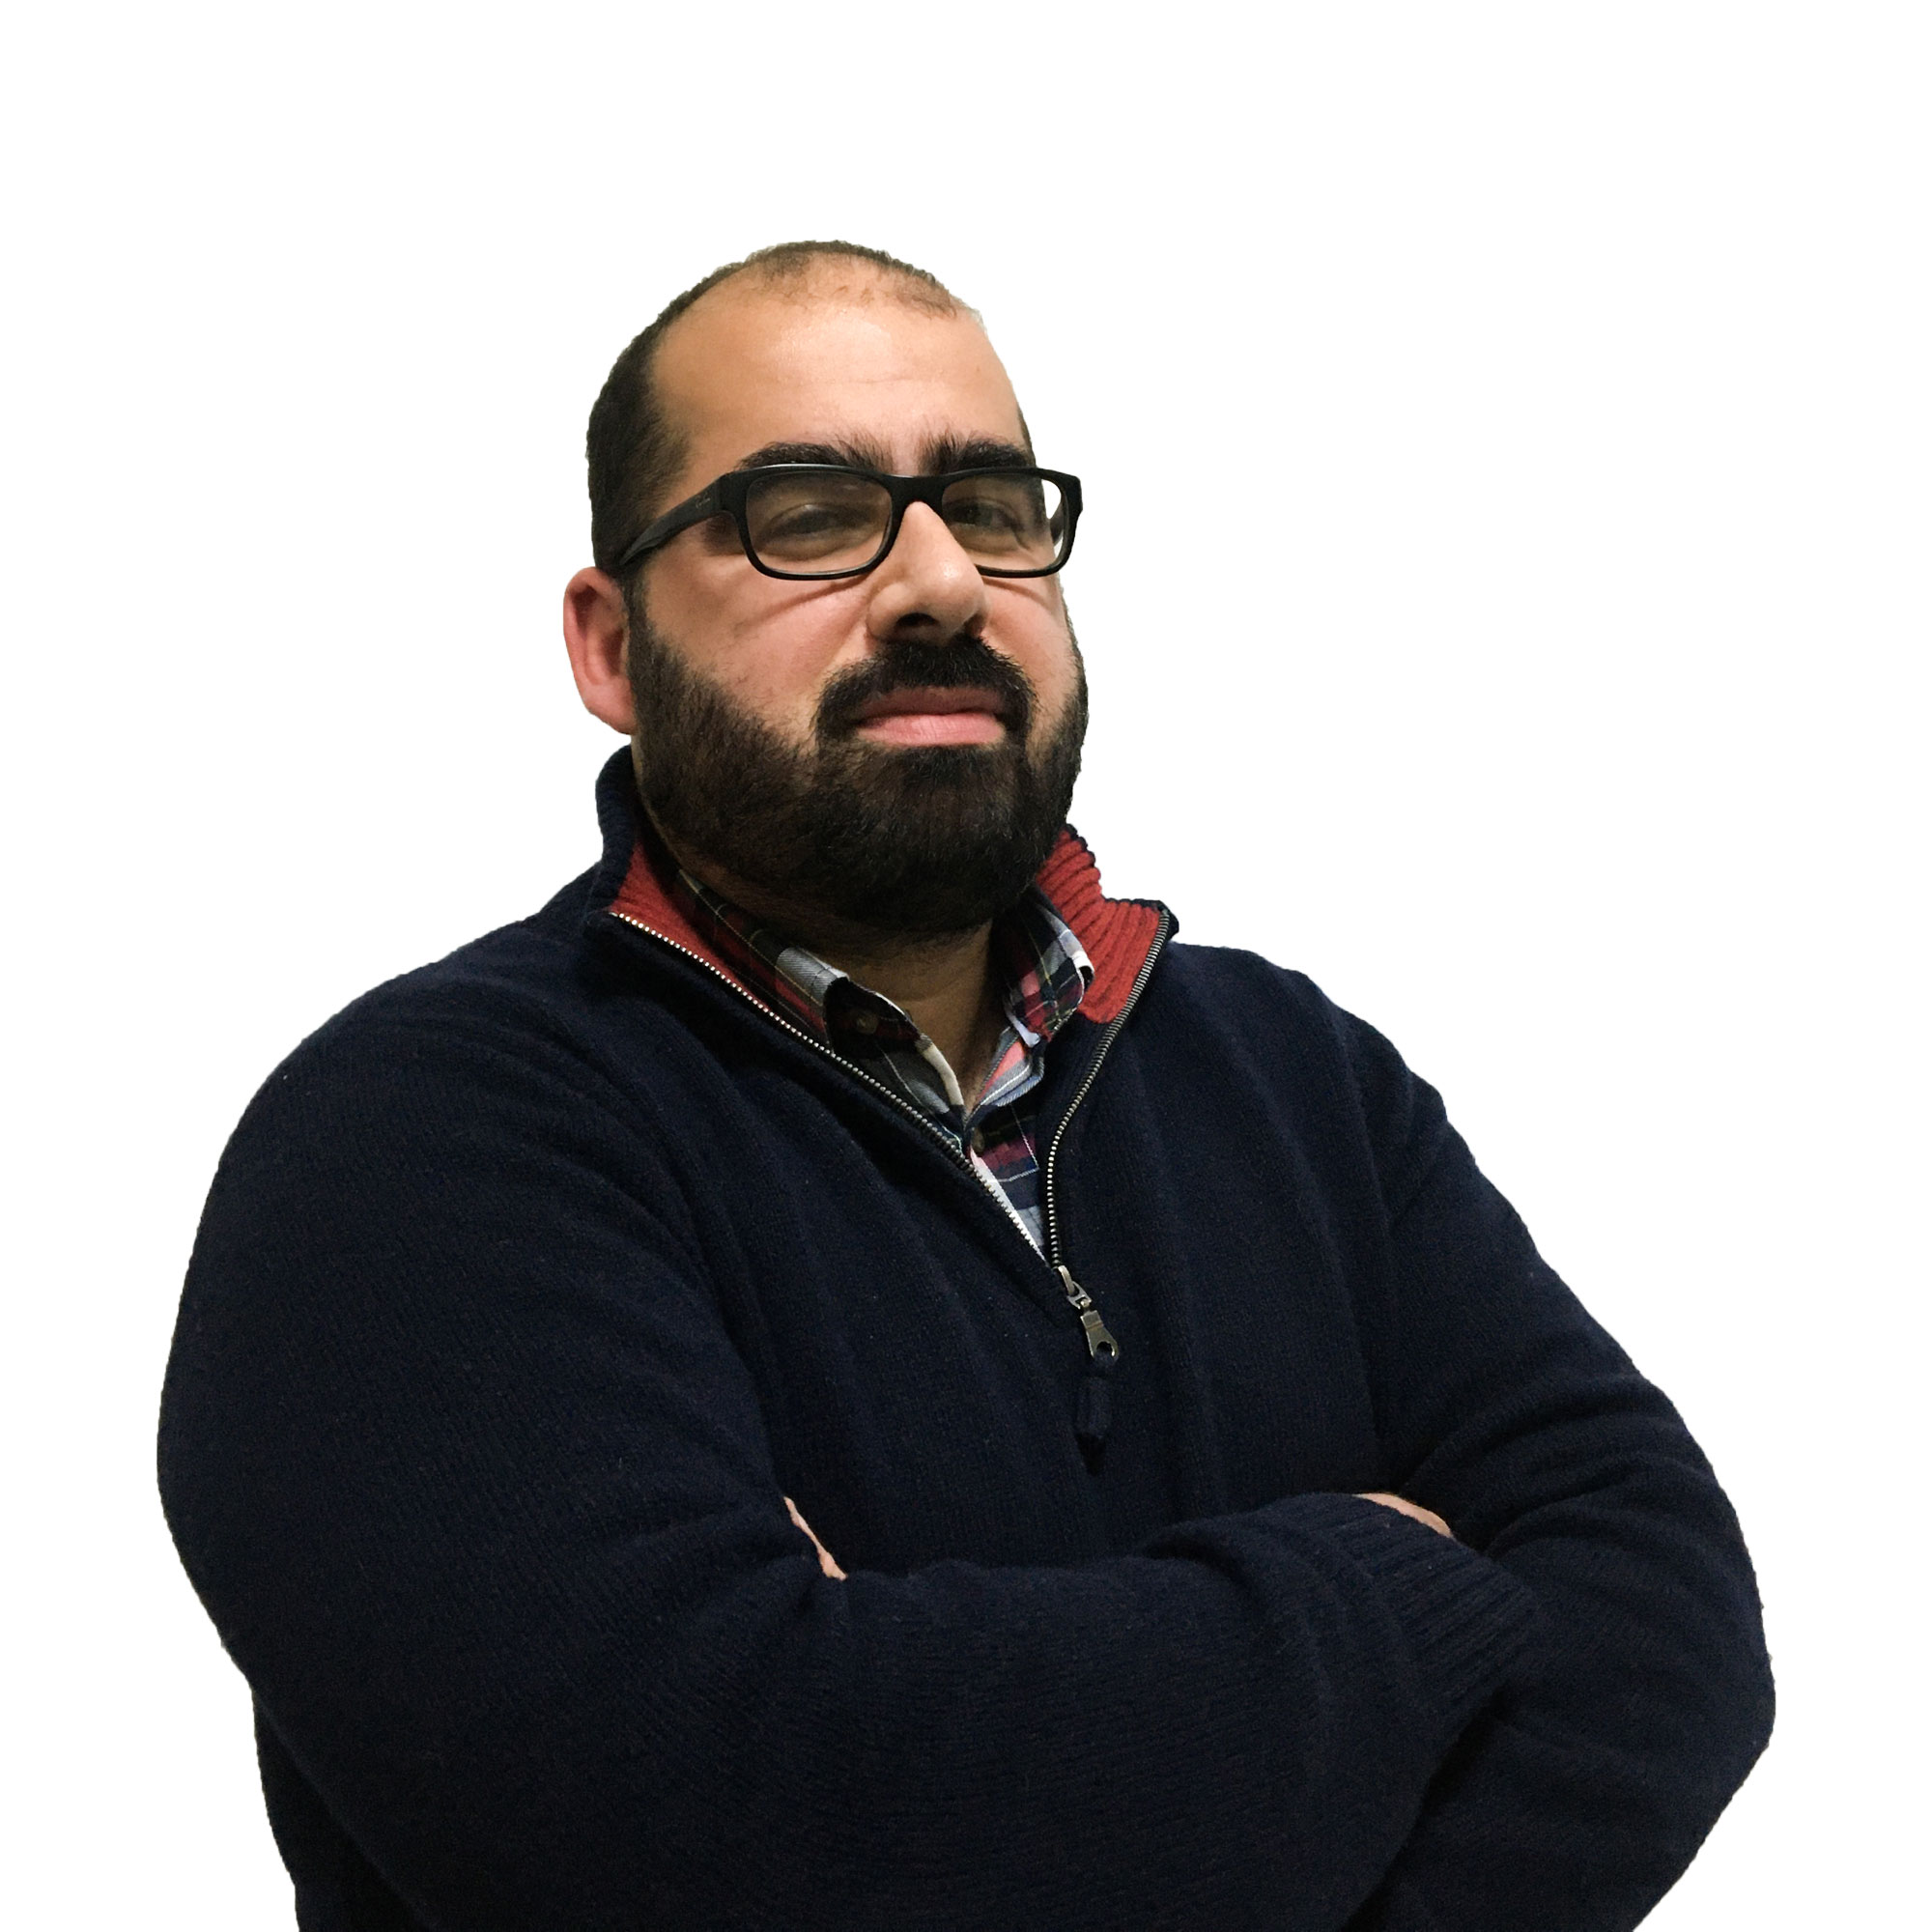 António Maia